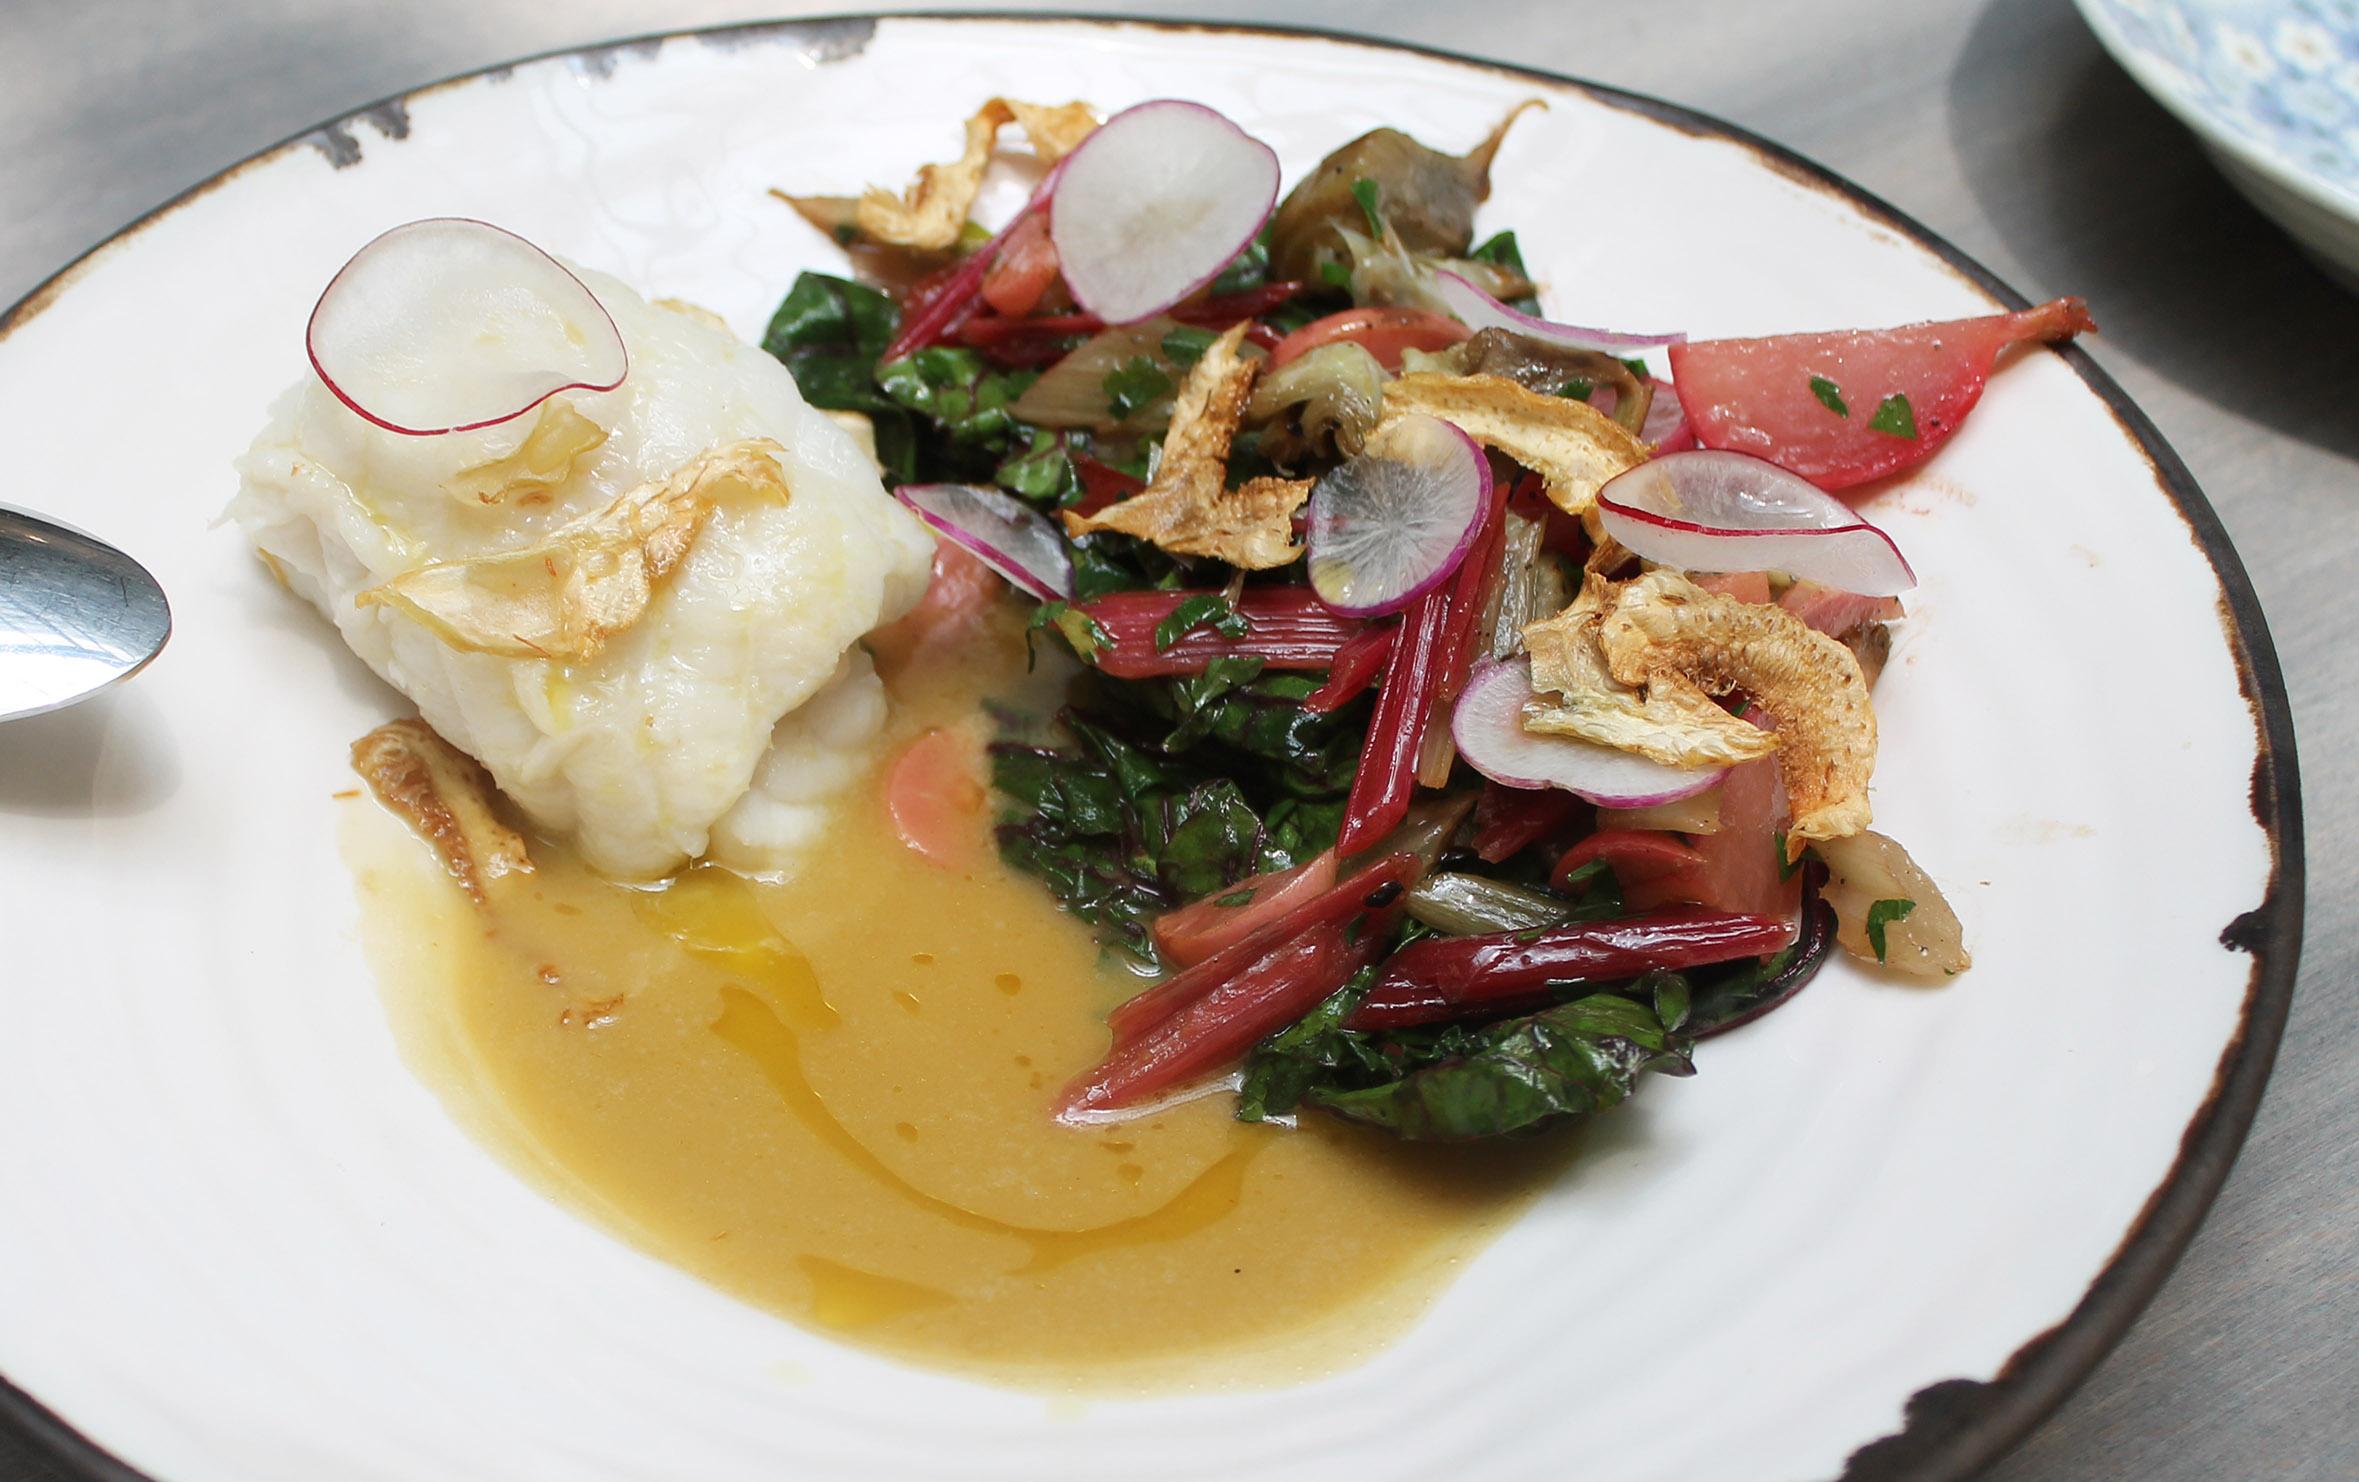 Slowly cooked cod, artichoke, radish, parsley, barigoule jus